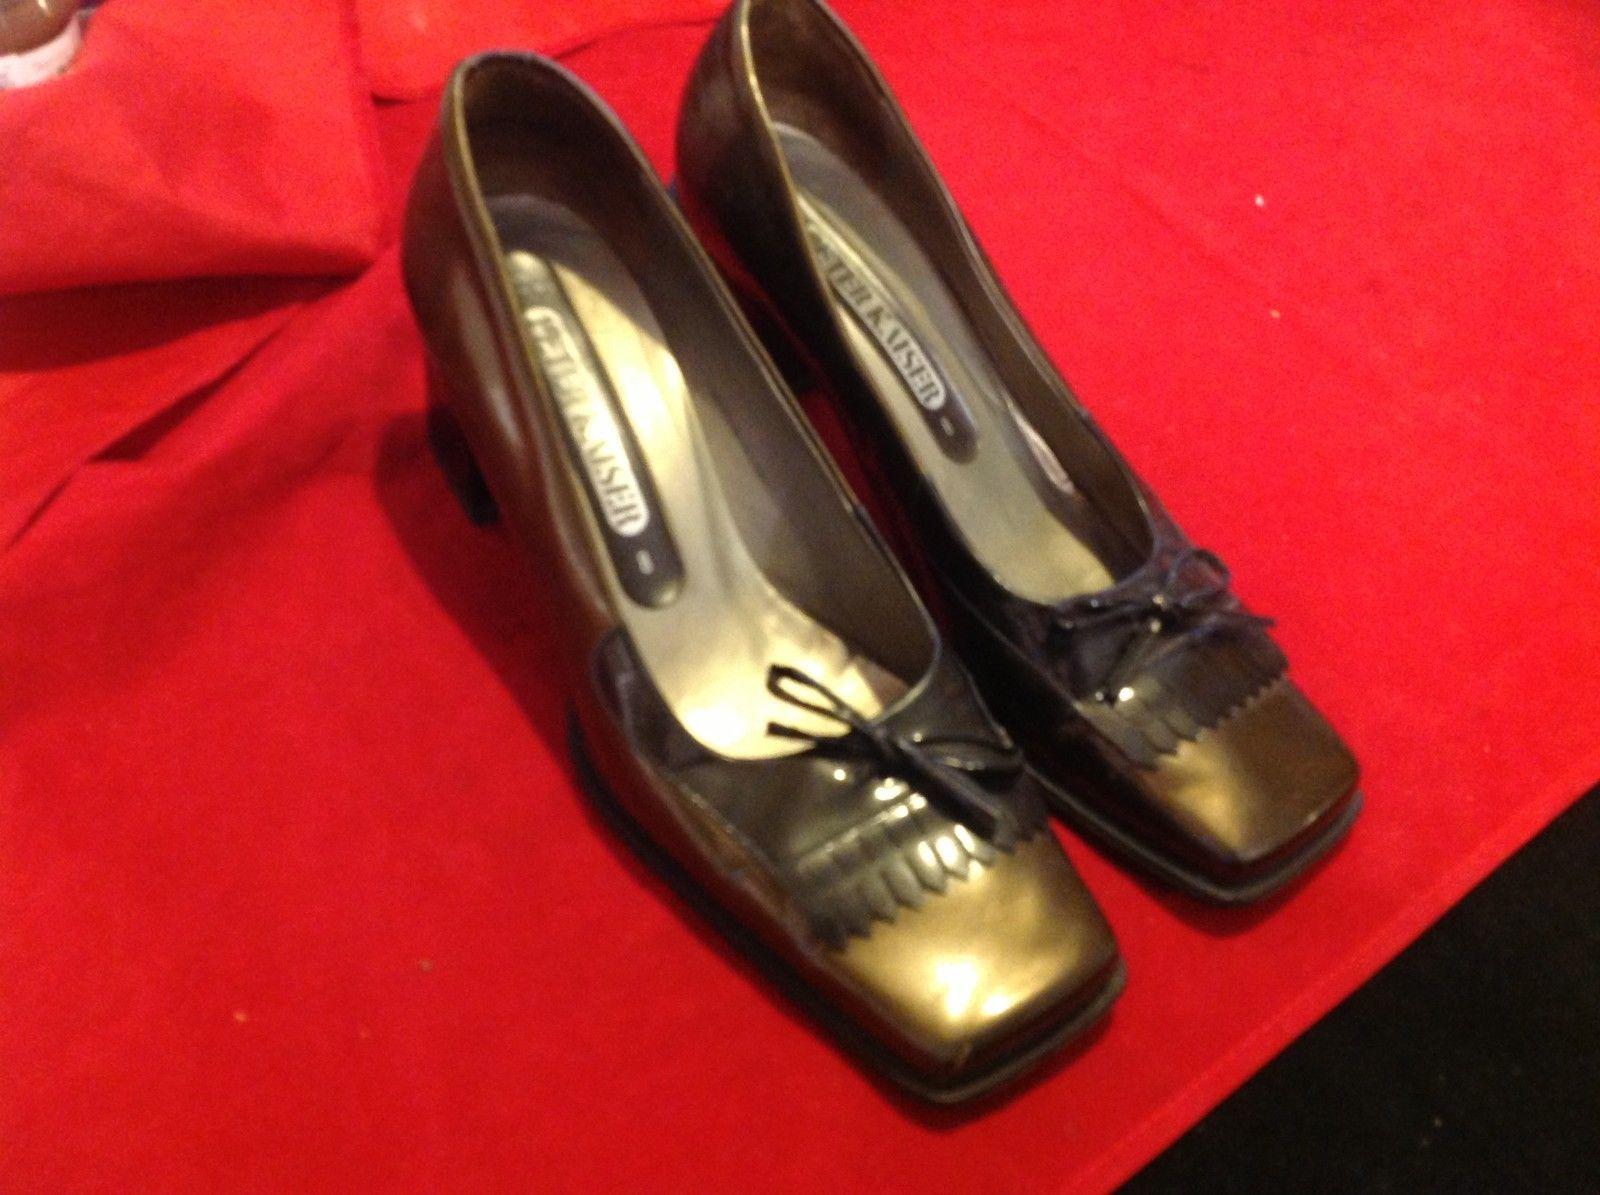 "Peter Kalser 5 1/2 Made  in Germany black sandals 4"" heel golden brown"